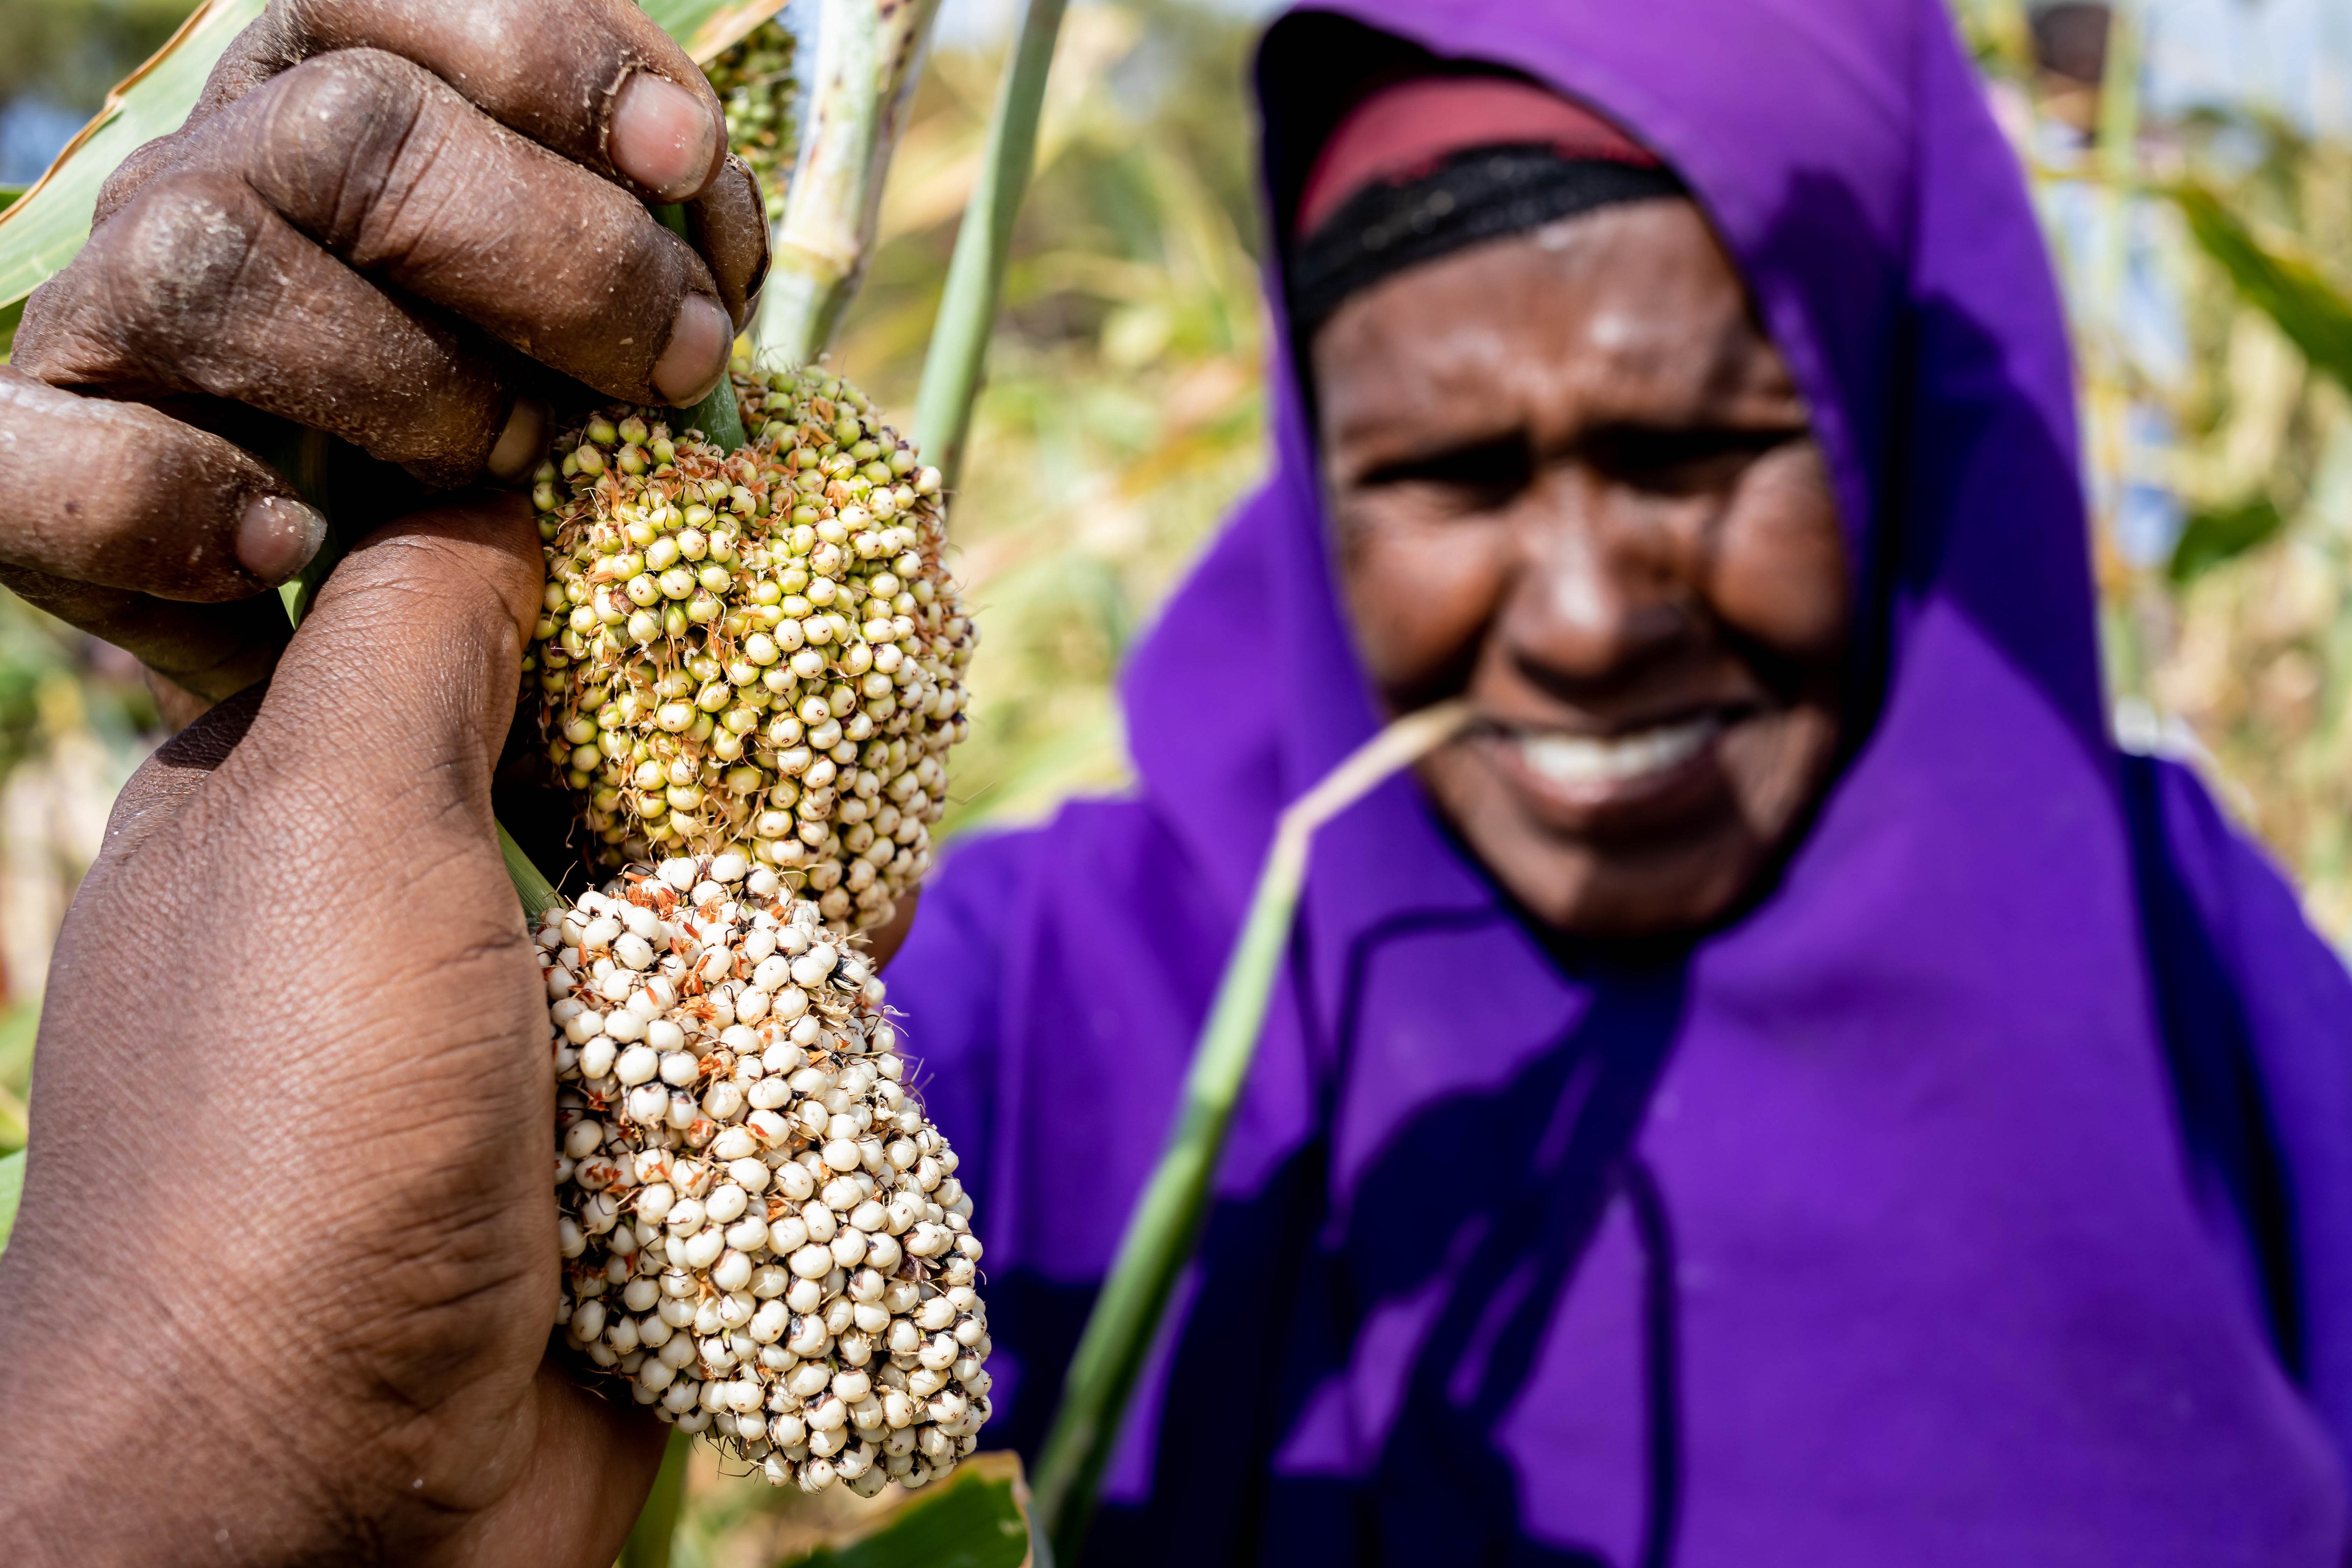 Somalia | Fall armyworm and Farmer Field School activities